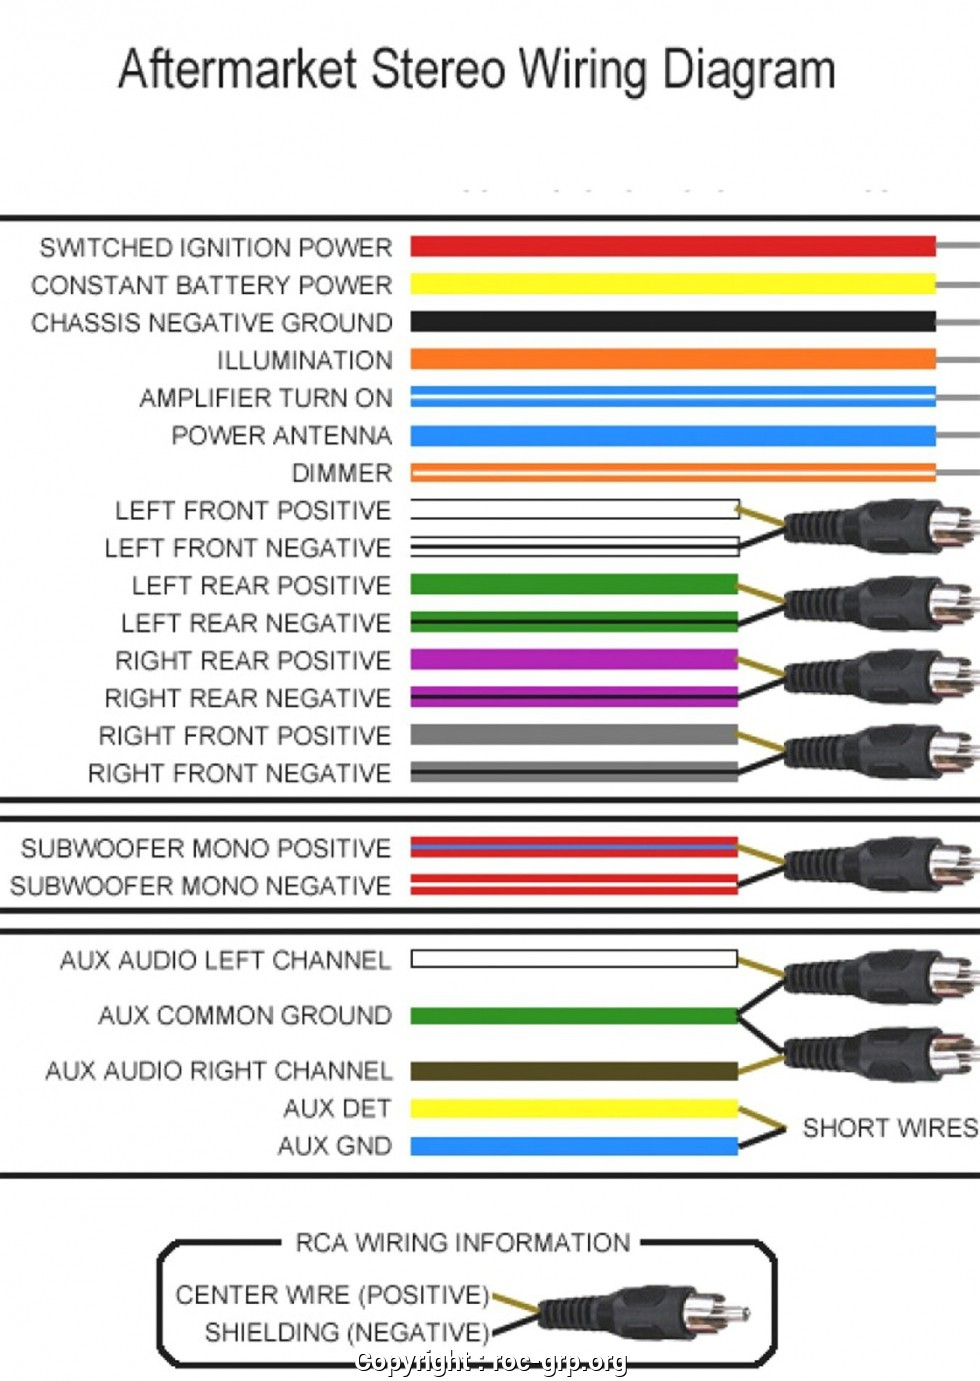 Sony Aftermarket Radio Wiring - Wiring Diagrams Hubs - Radio Wiring Diagram